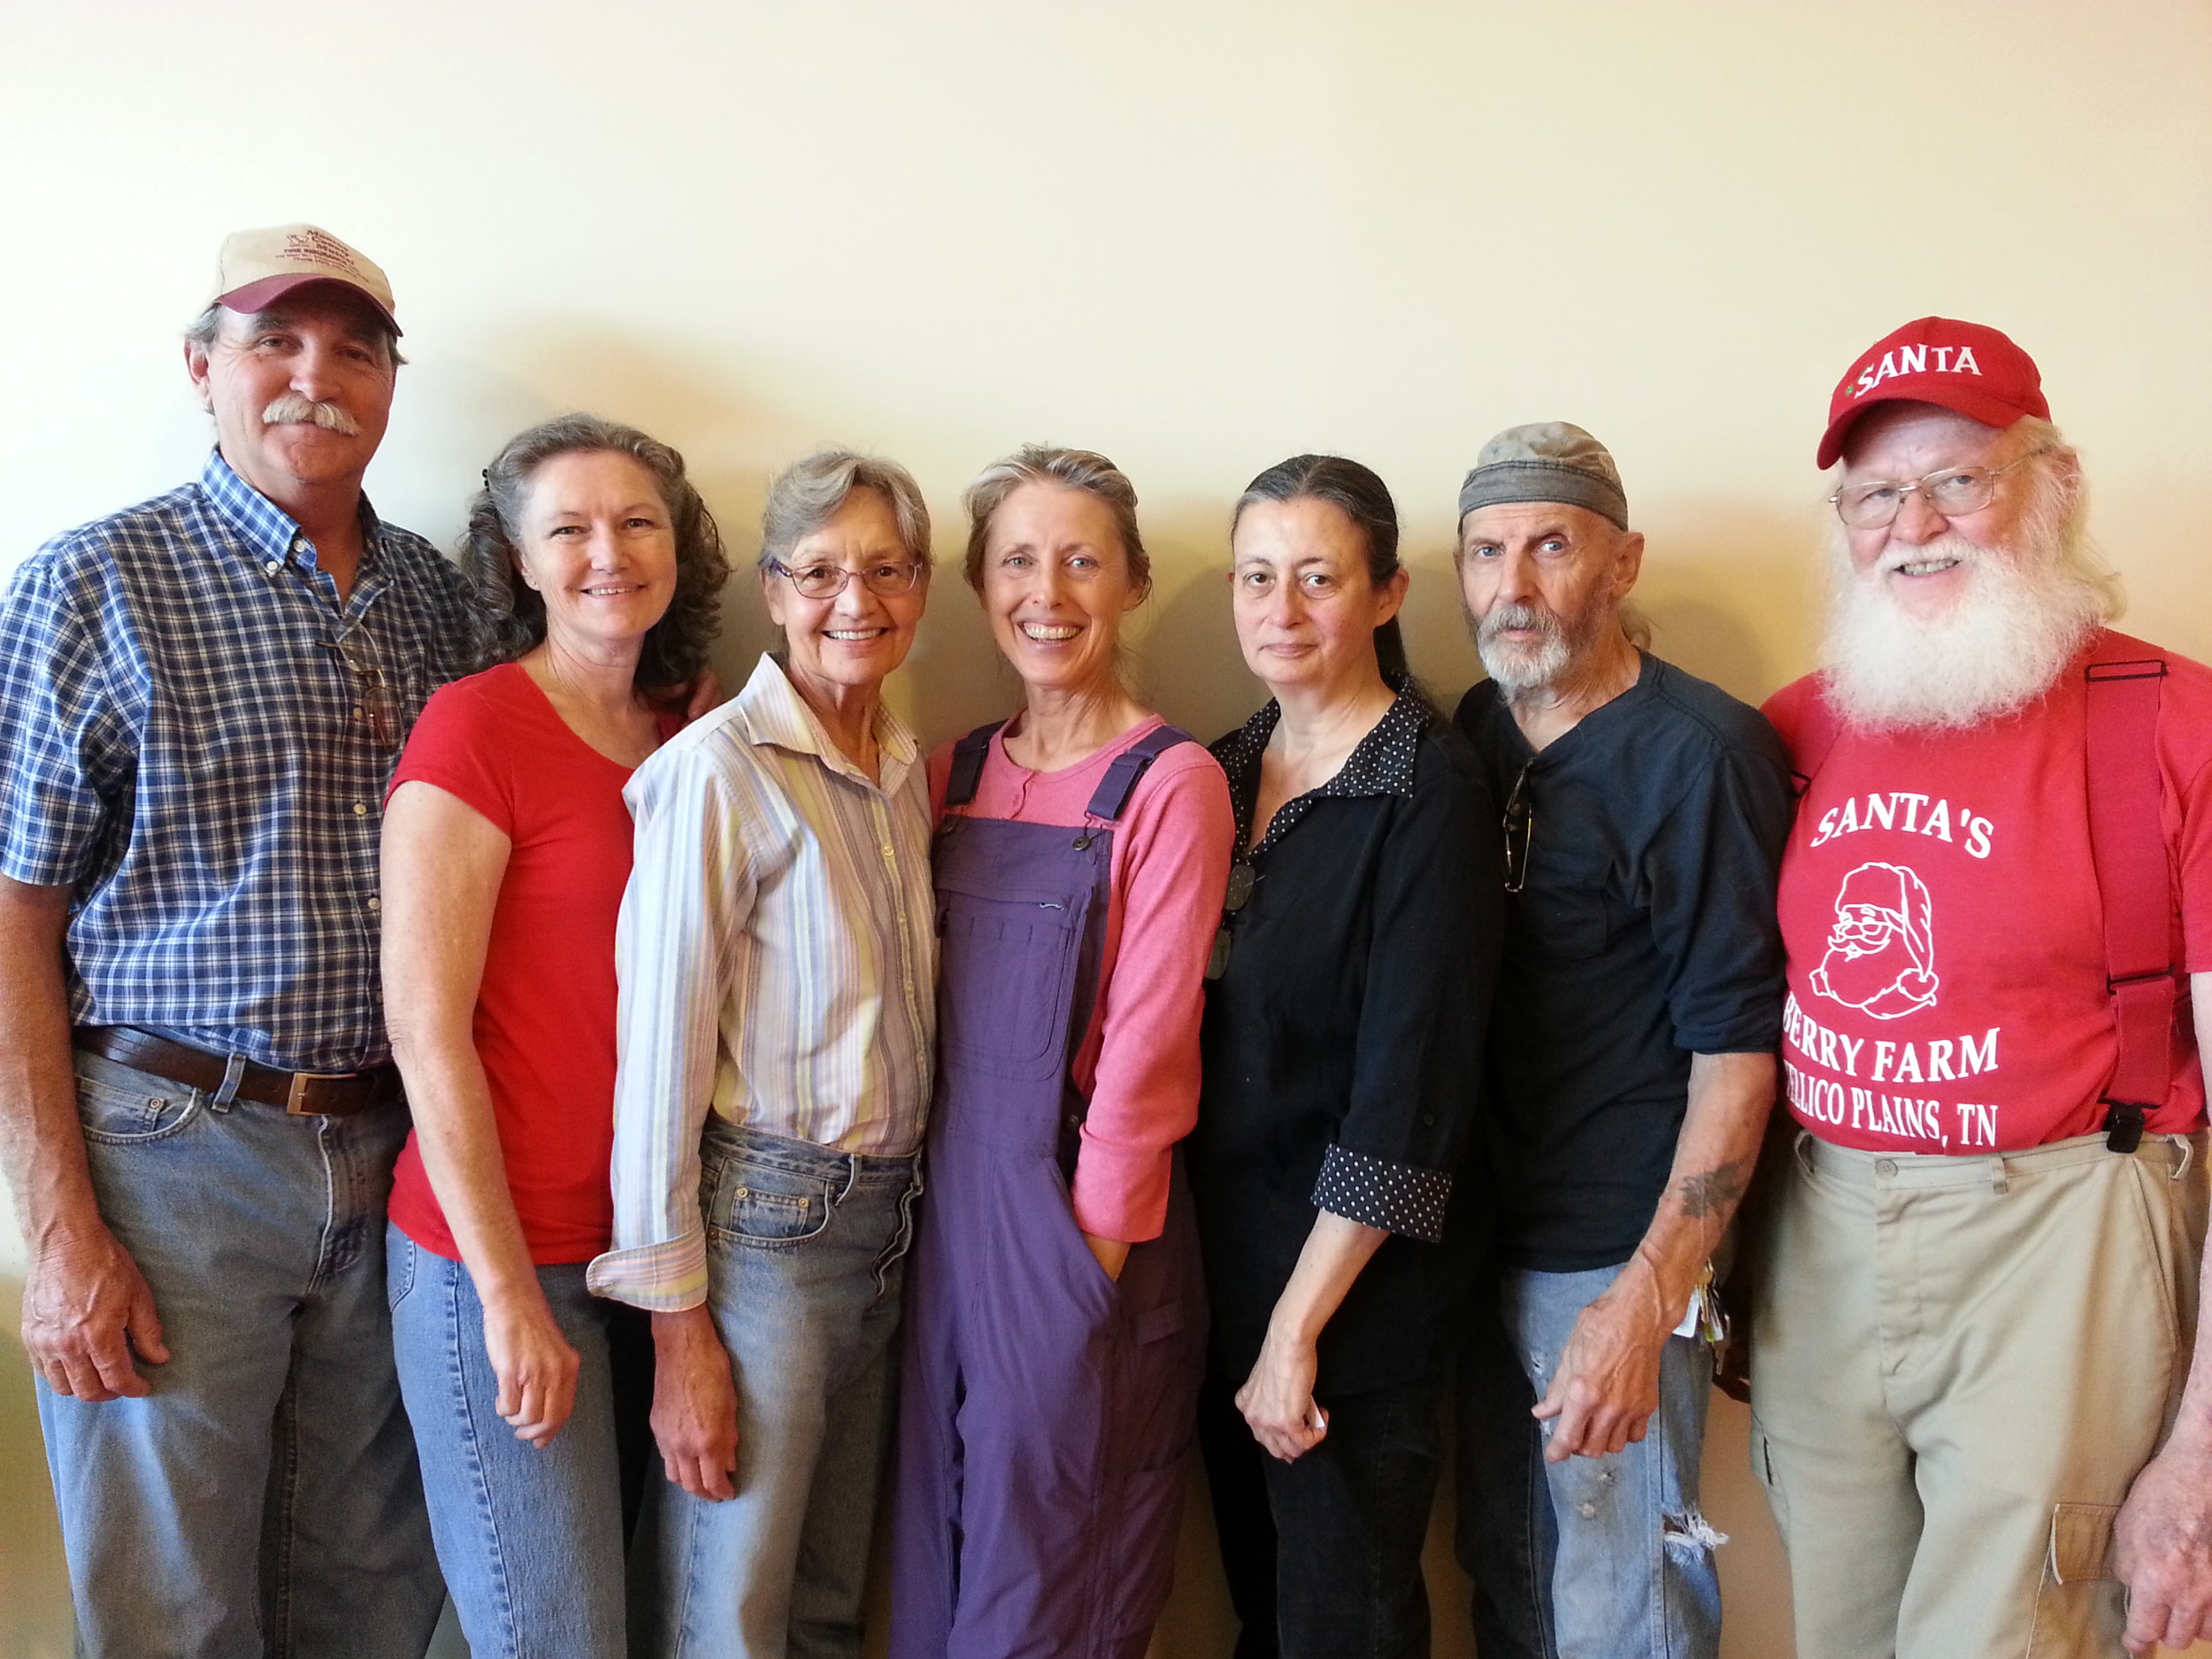 The group behind the Tellico Plains Farmer's Market  https://www.facebook.com/MCFarmMarket/